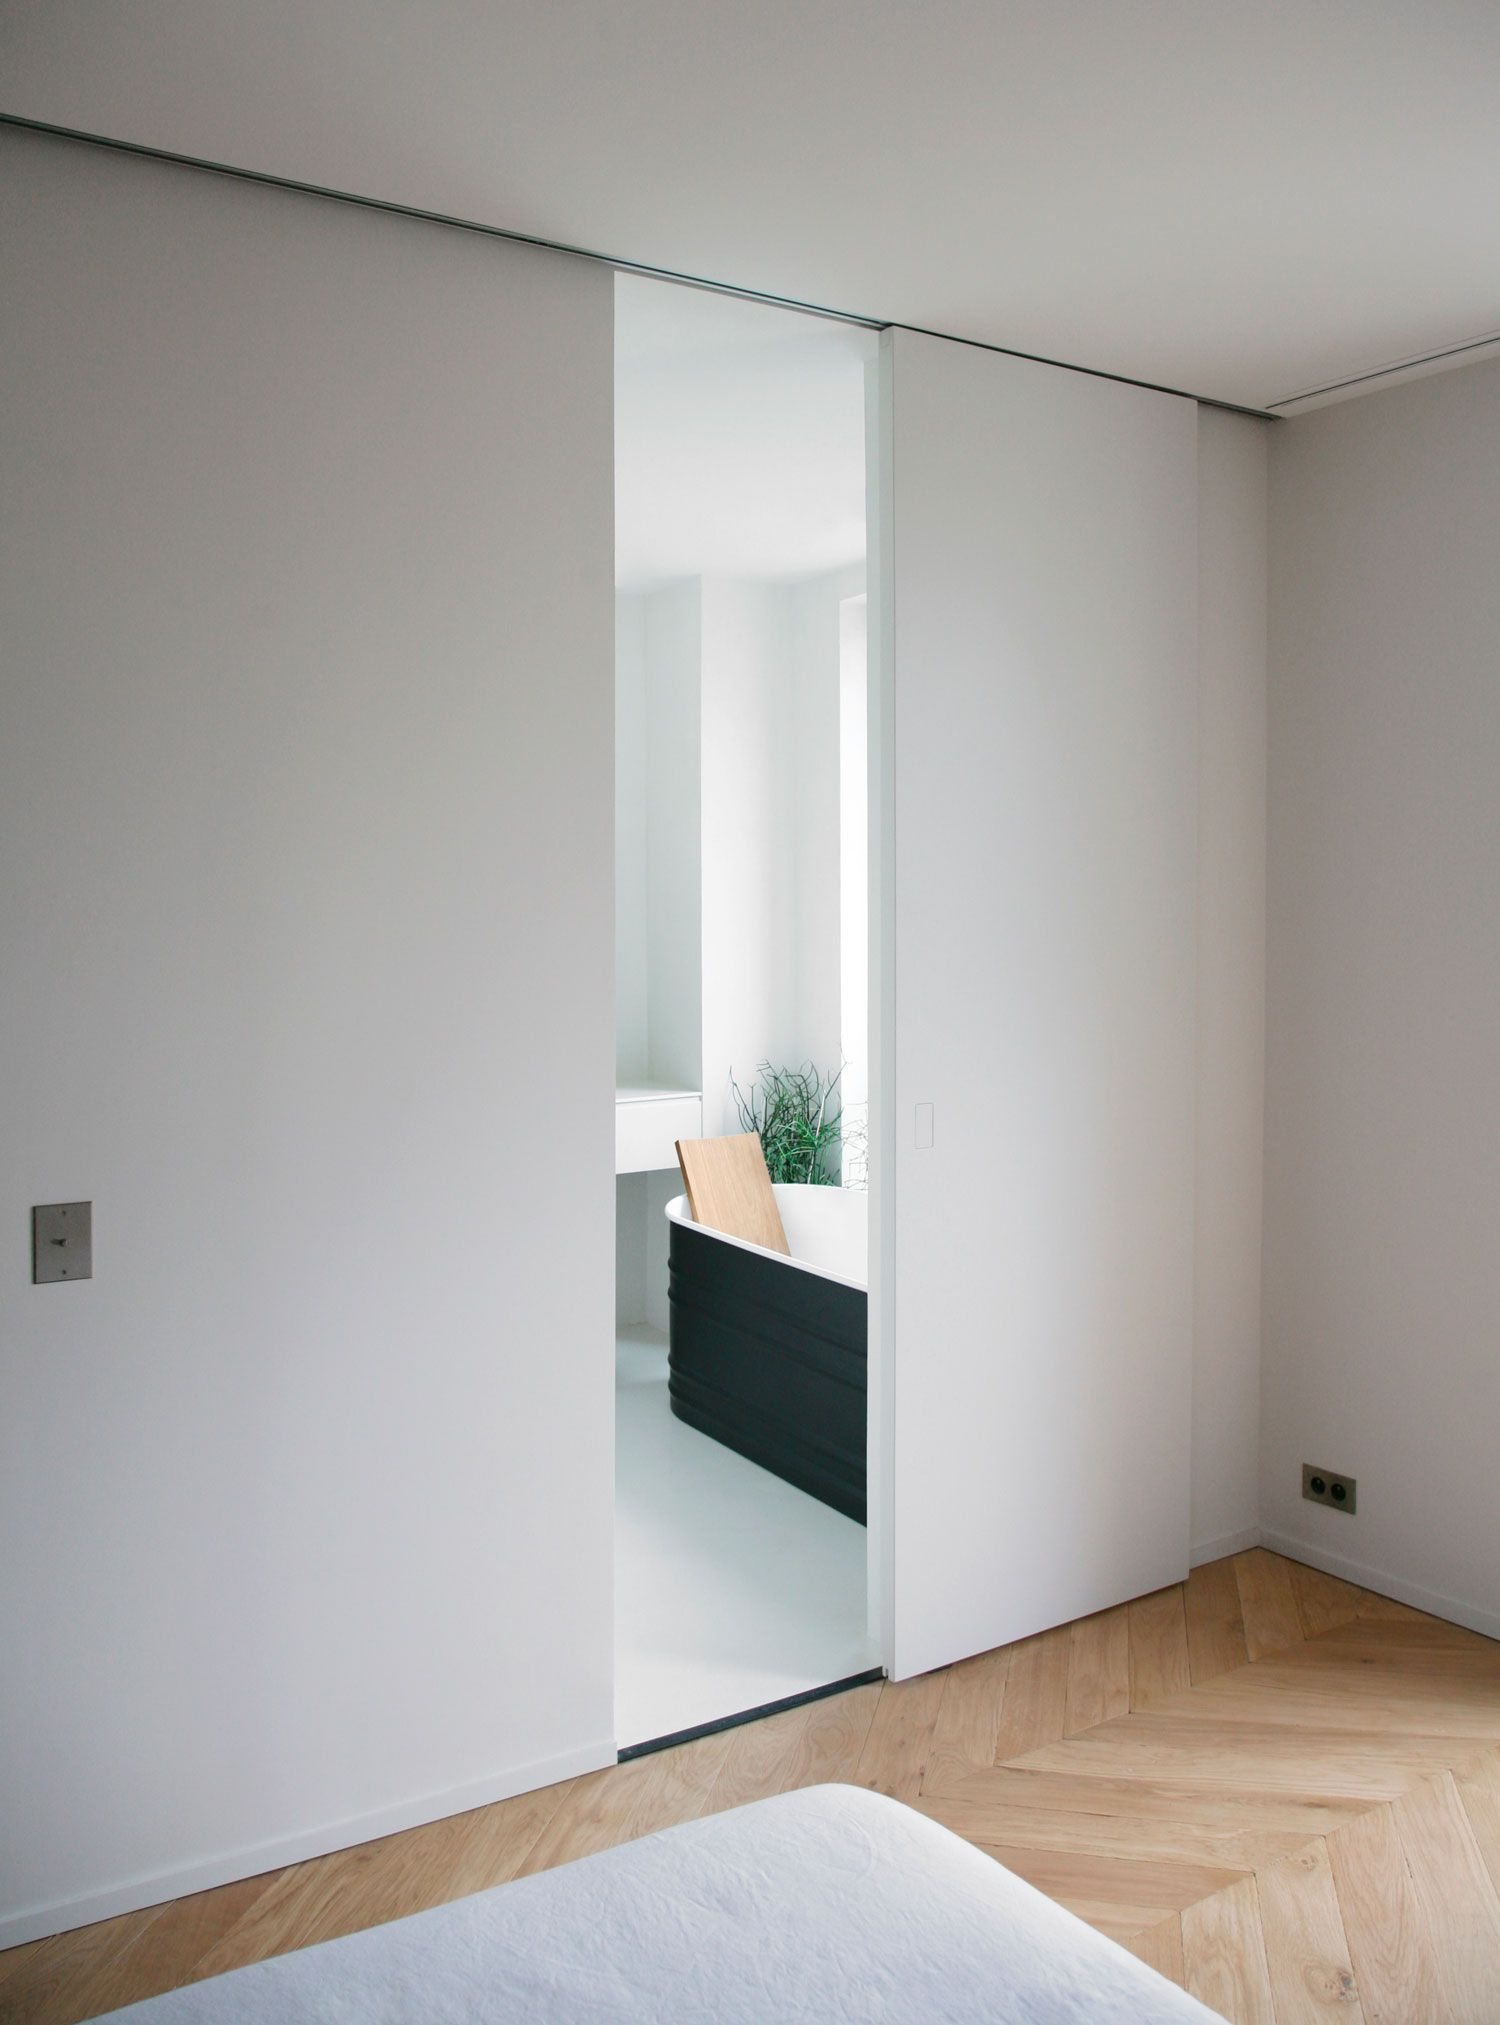 Haus außentor design rue du japon townhouse renovation in toulouse by rmgb  bathrooms